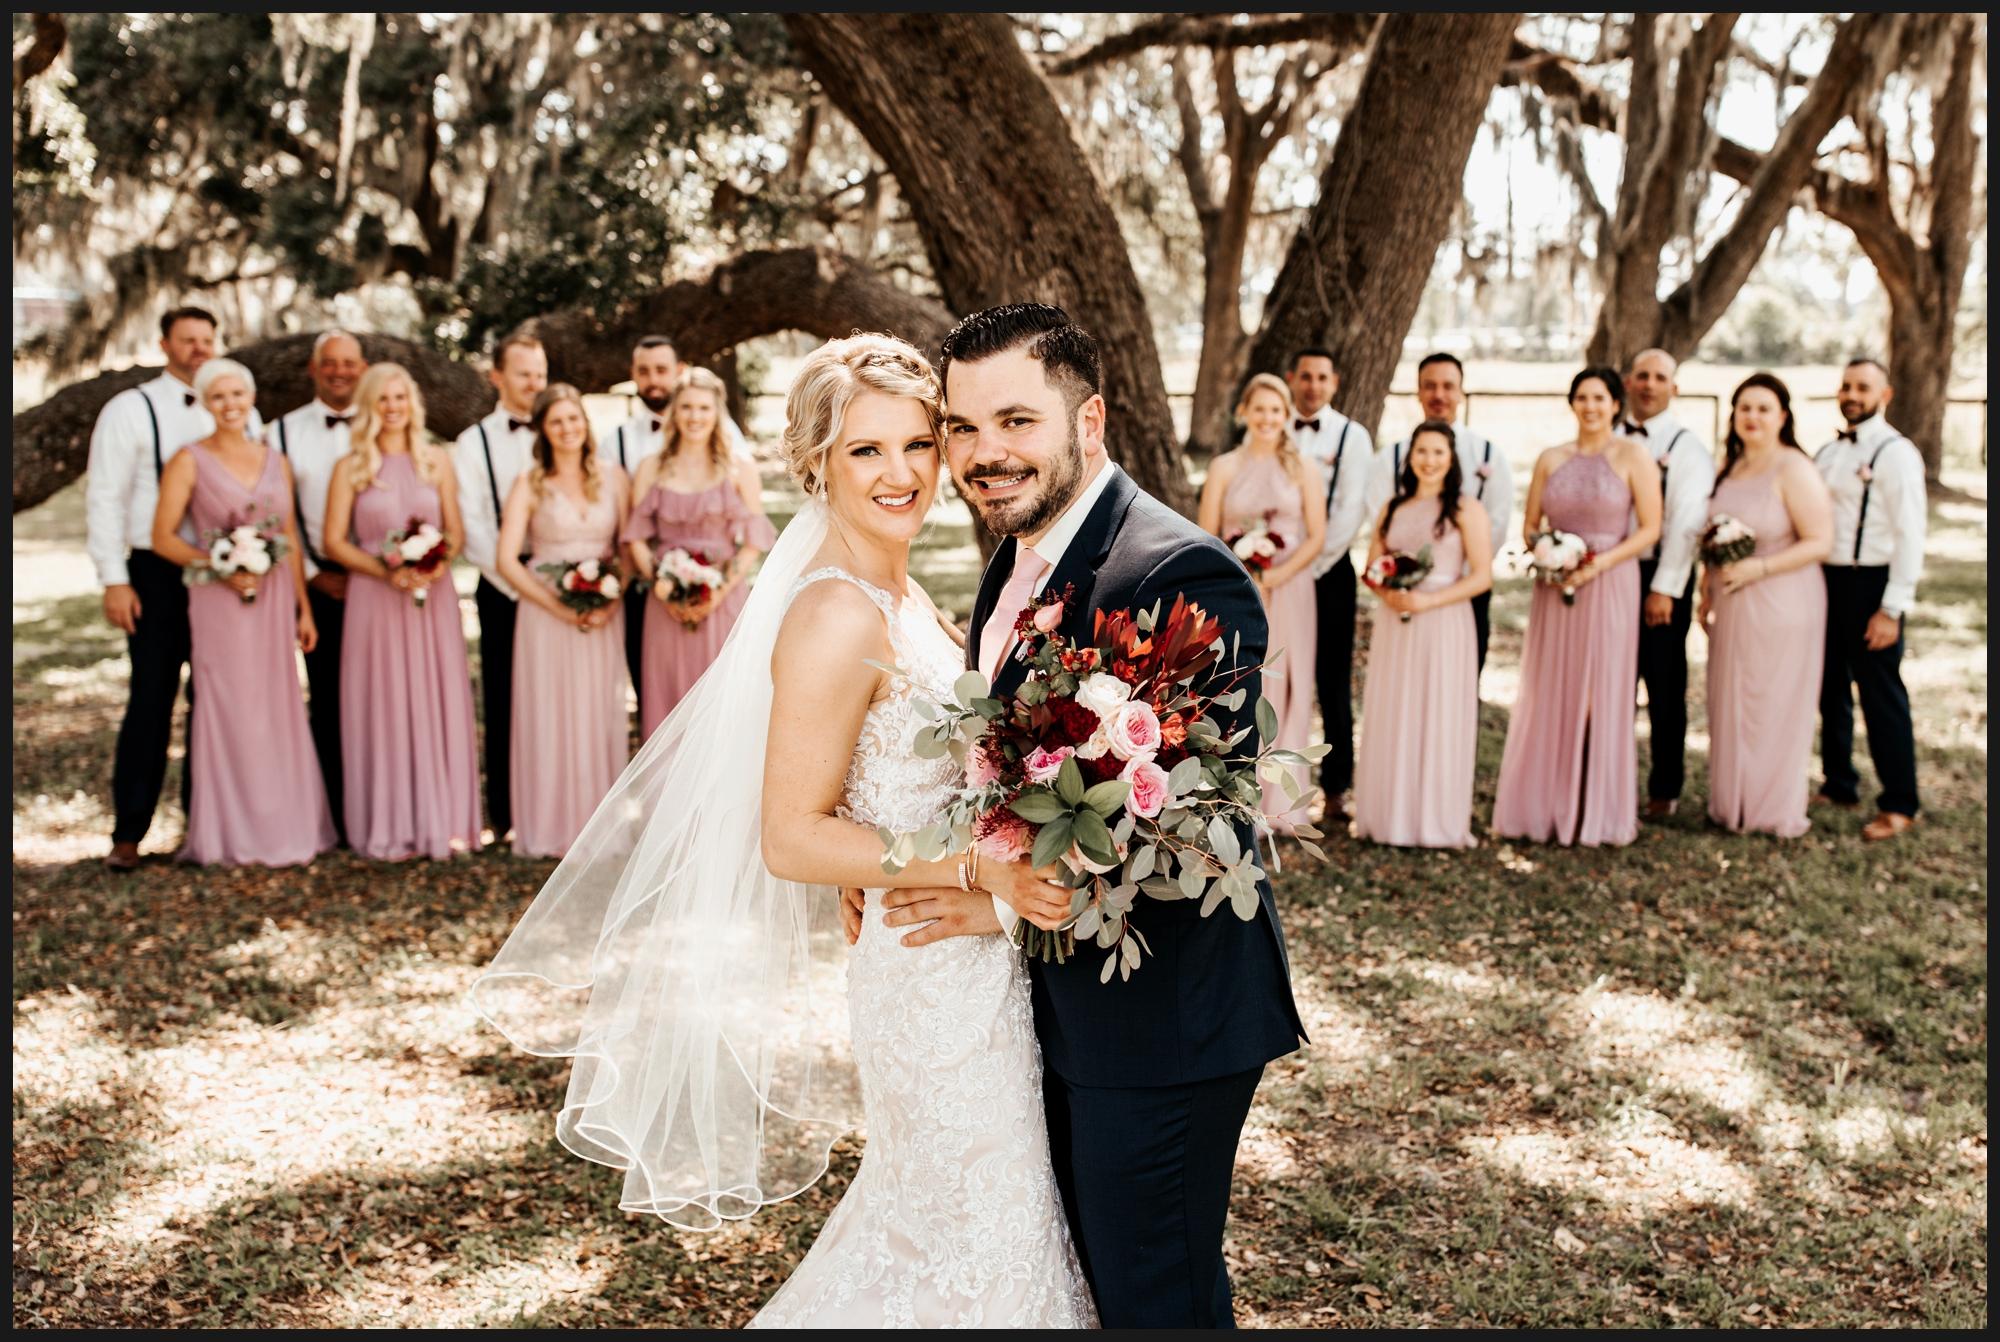 Orlando-Wedding-Photographer-destination-wedding-photographer-florida-wedding-photographer-hawaii-wedding-photographer_0587.jpg